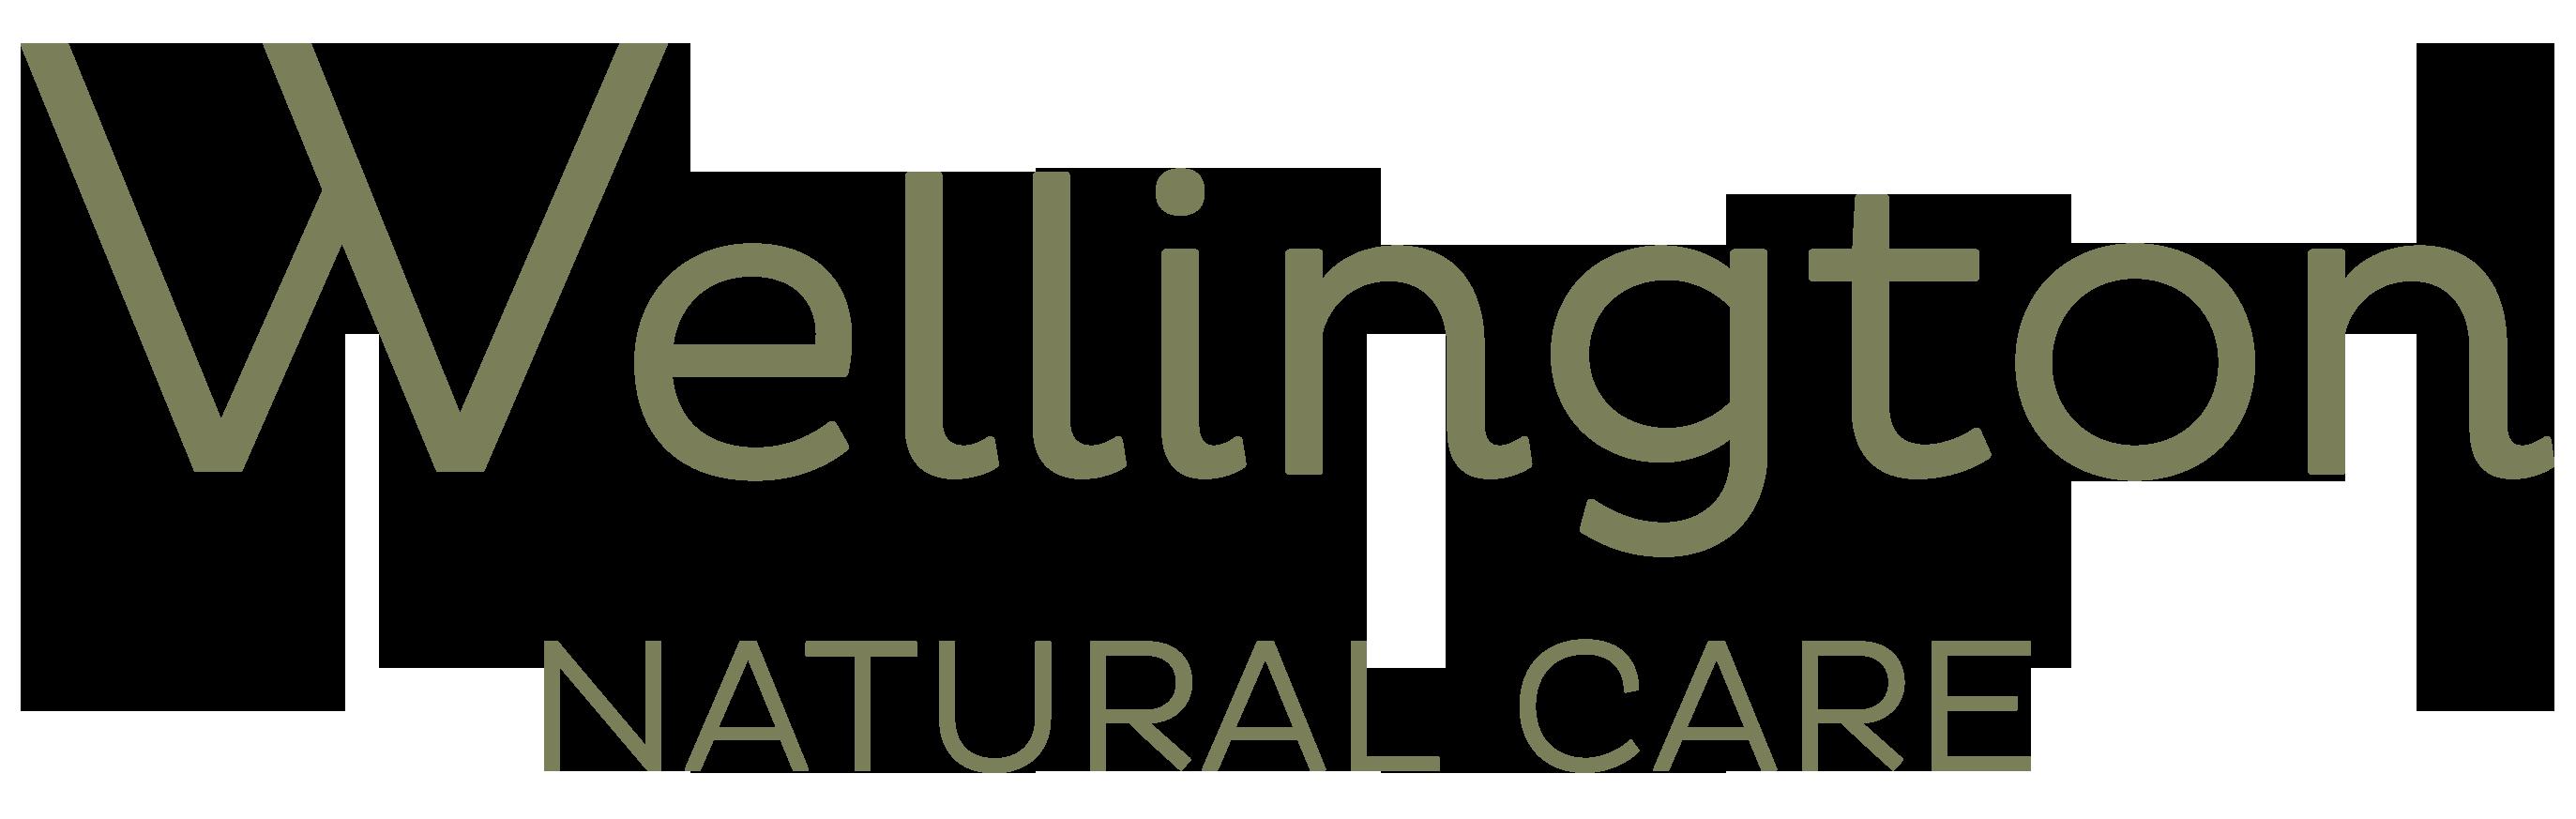 Wellington Natural Care